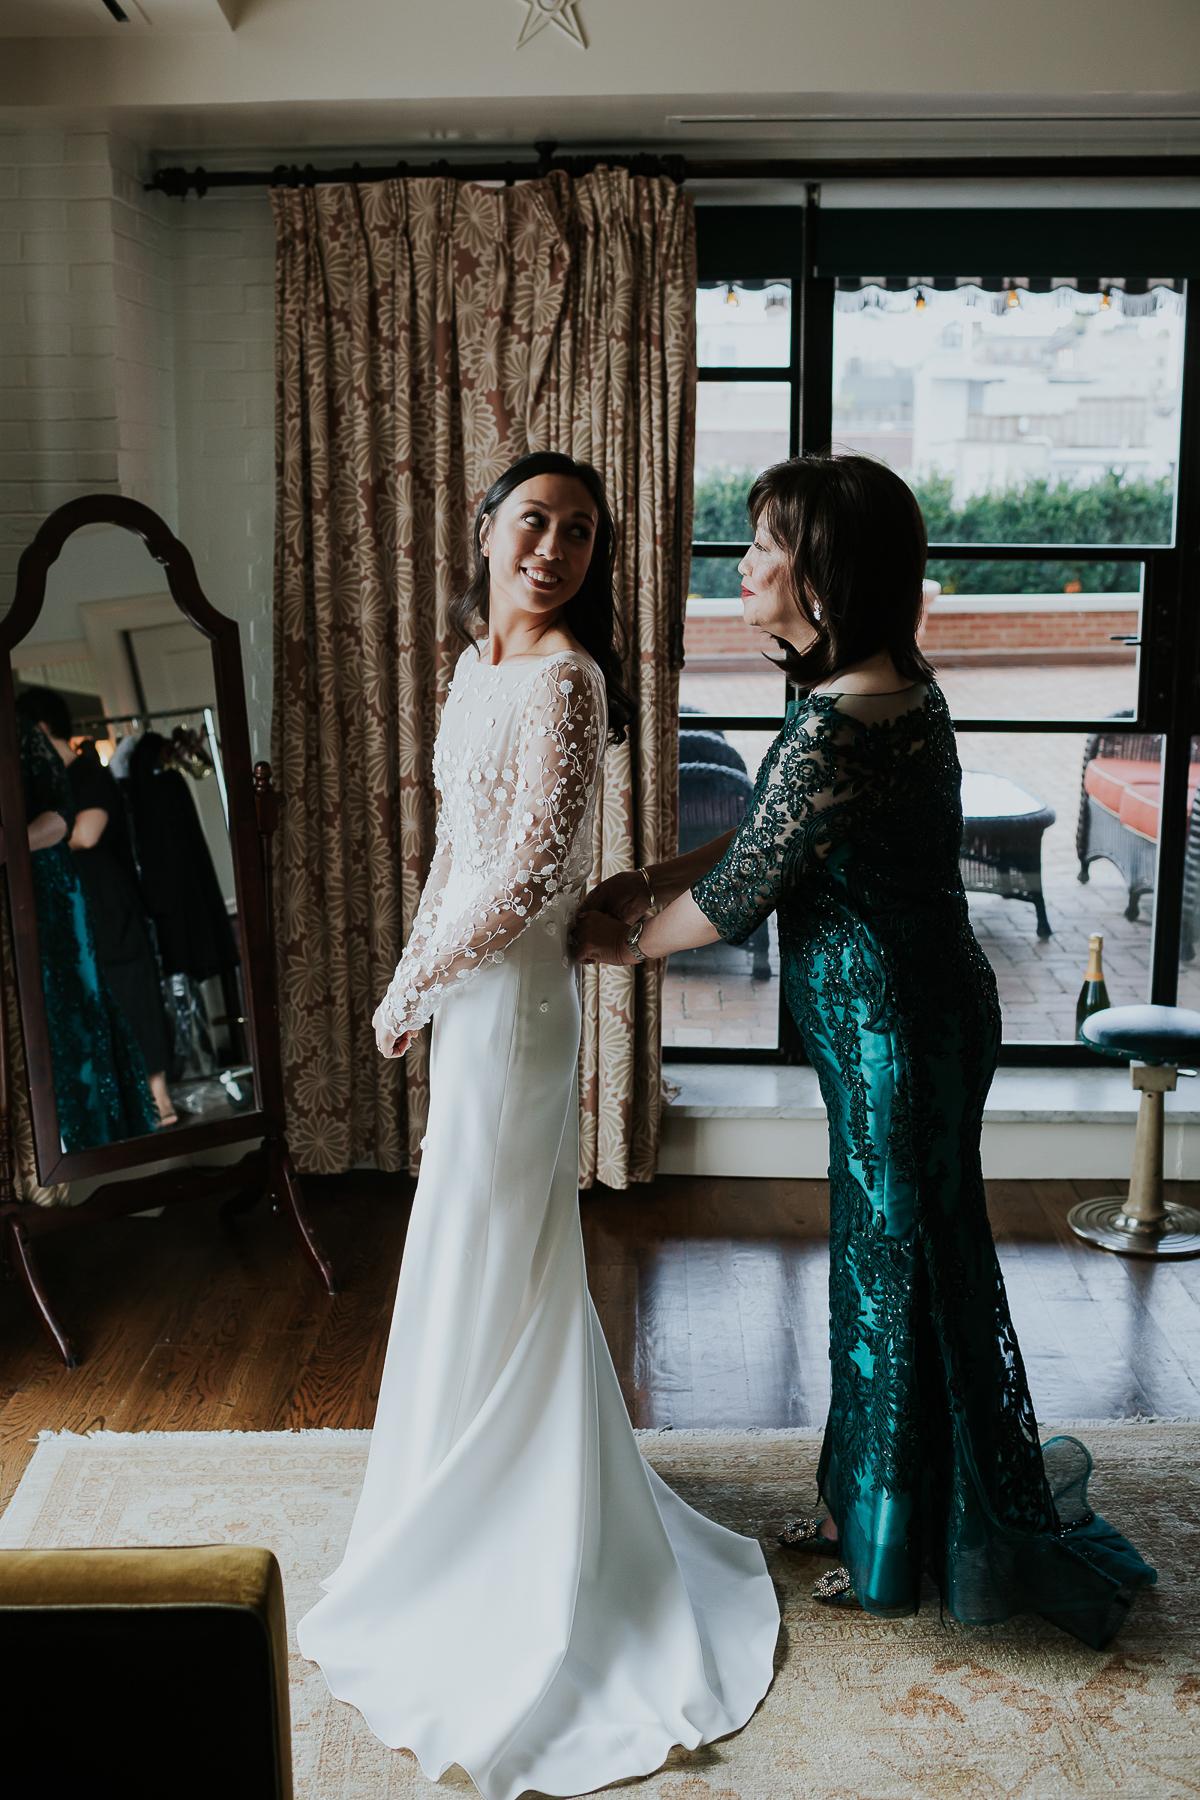 Bowery-Hotel-NYC-Documentary-Wedding-Photos-7.jpg